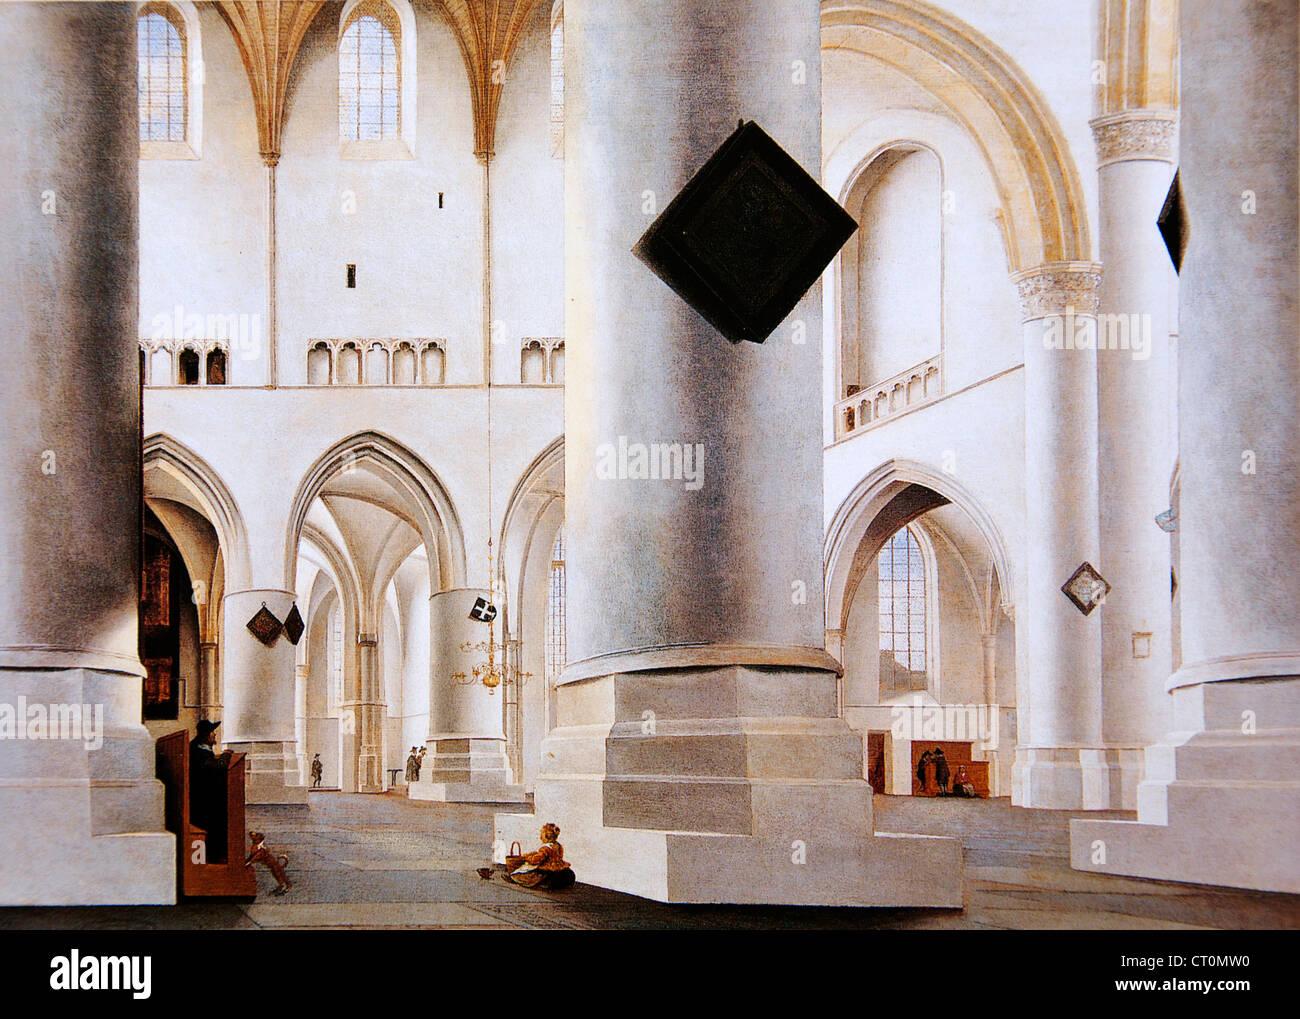 Pieter Jansz. Saenredam - Interior of the Grote Kerk, Haarlem Stock Photo